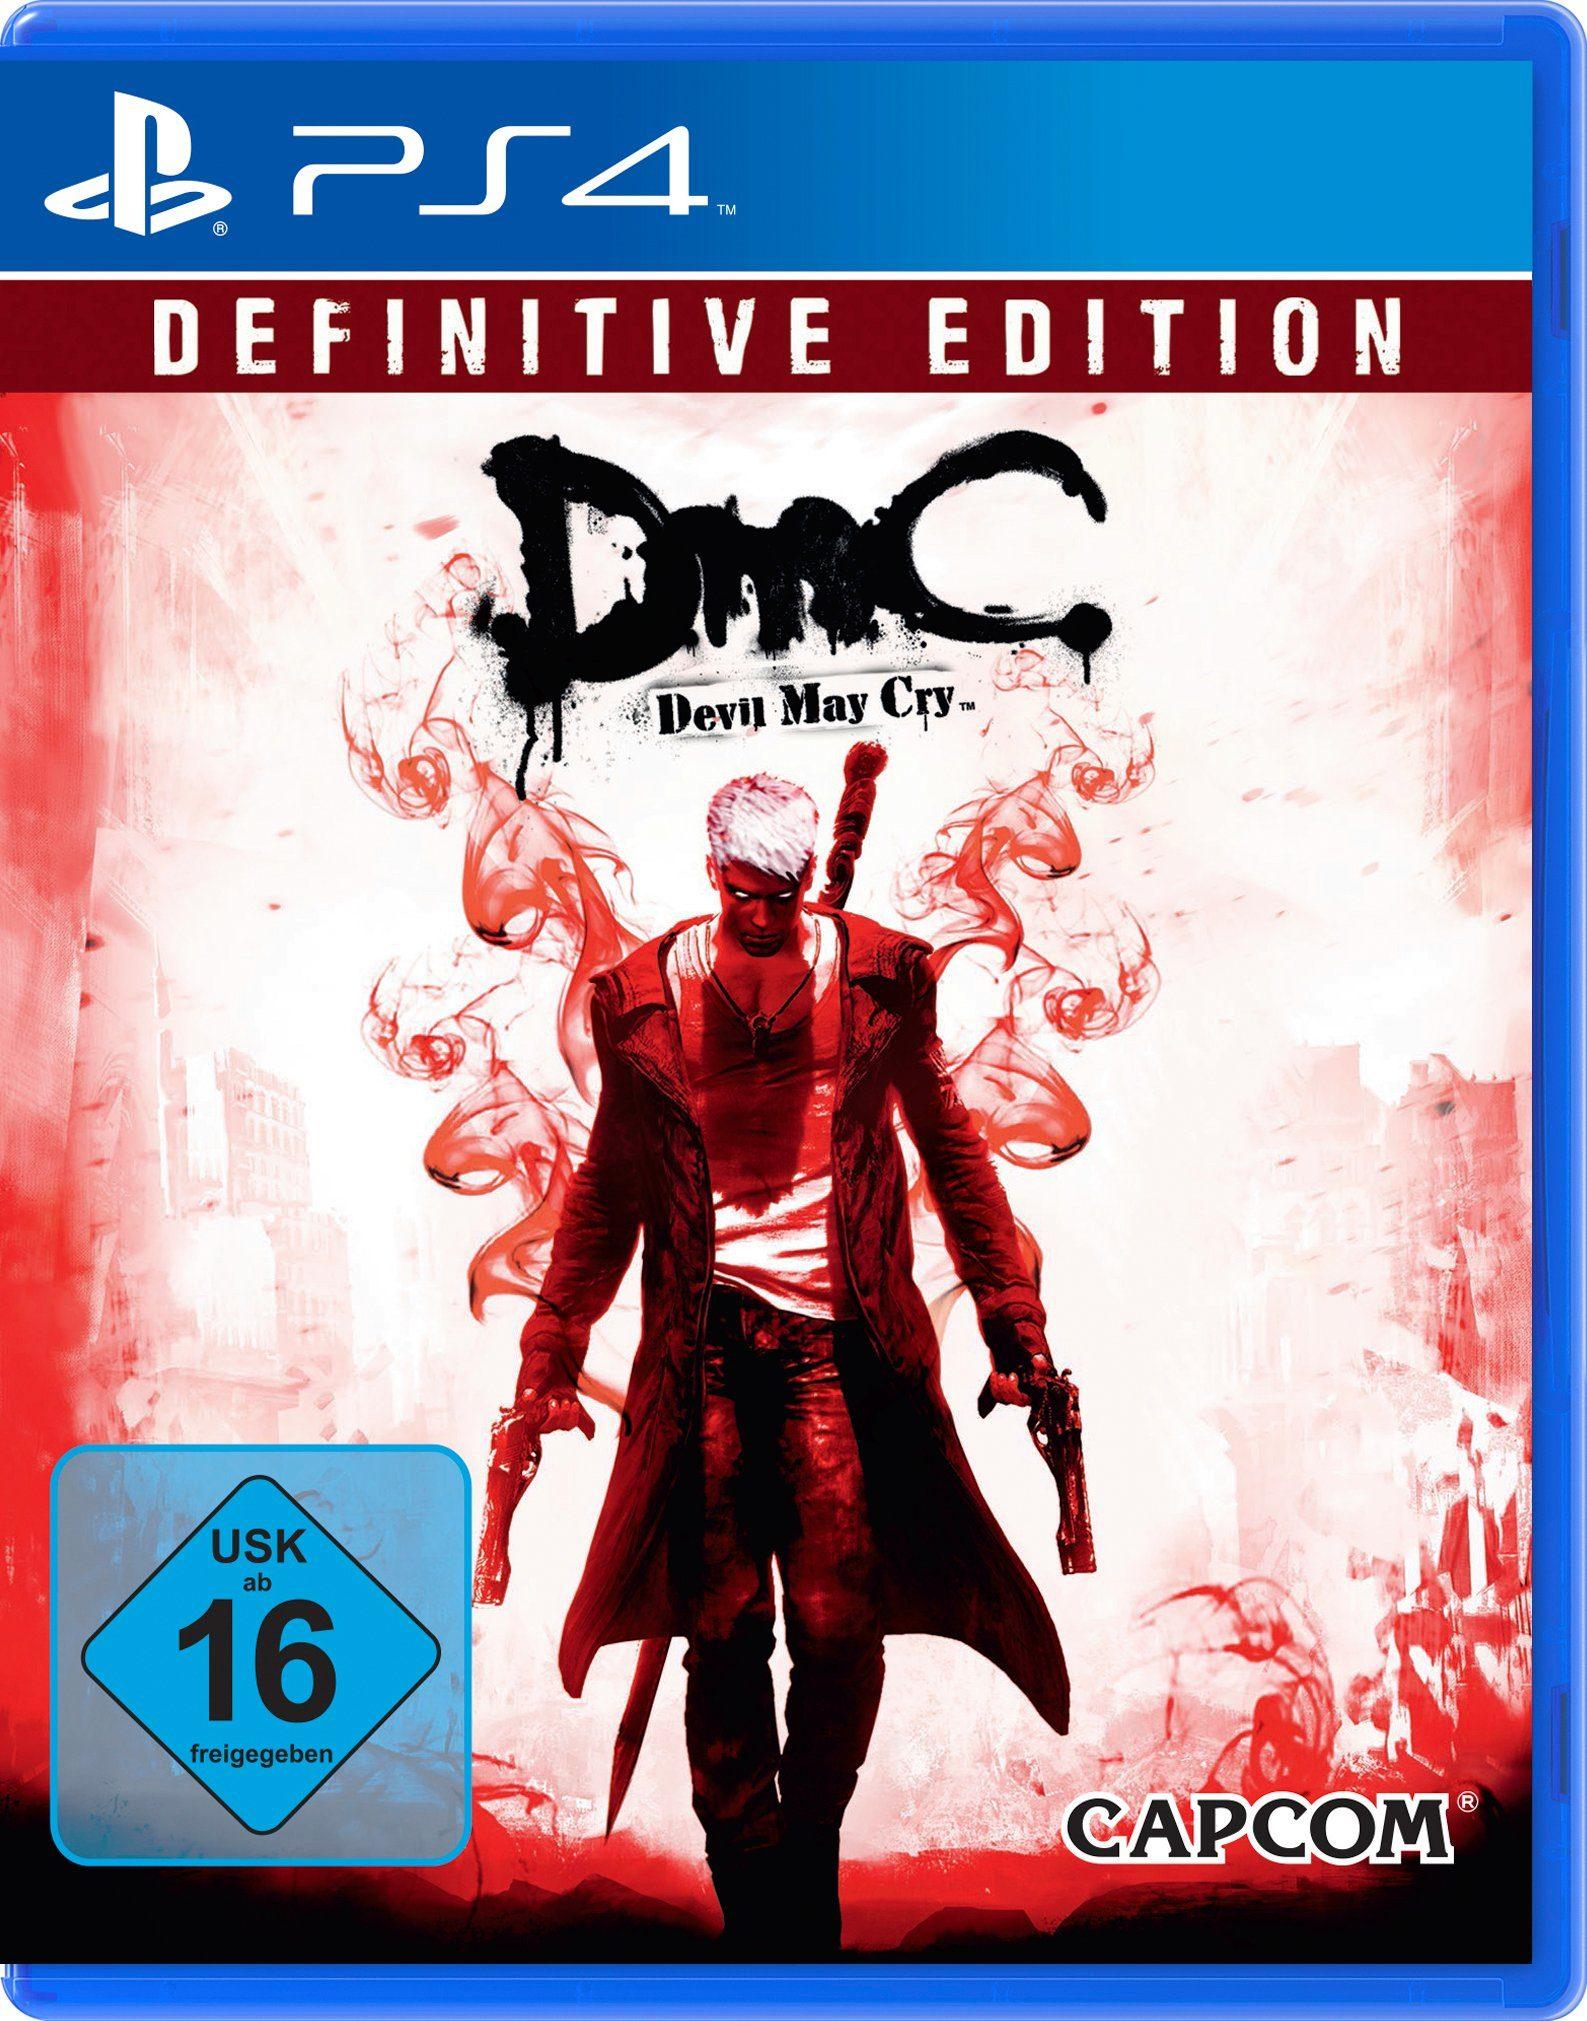 Capcom Software Pyramide - Playstation 4 Spiel »DMC Devil May Cry Definitive Edition«